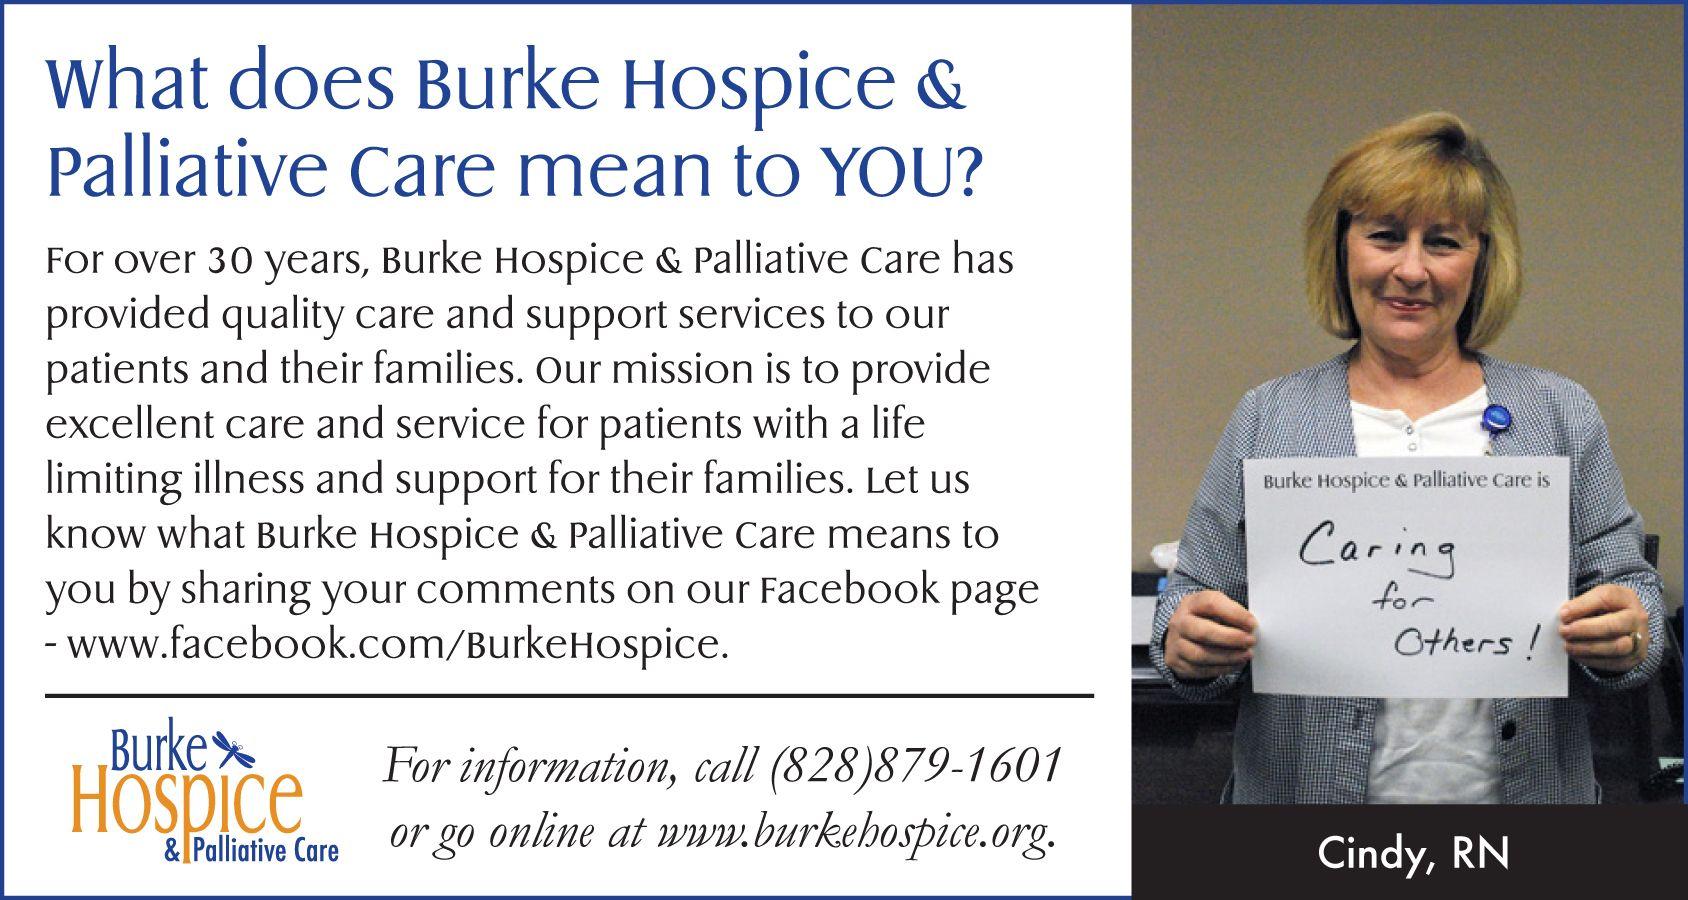 Pin on Burke Hospice & Palliative Care Materials